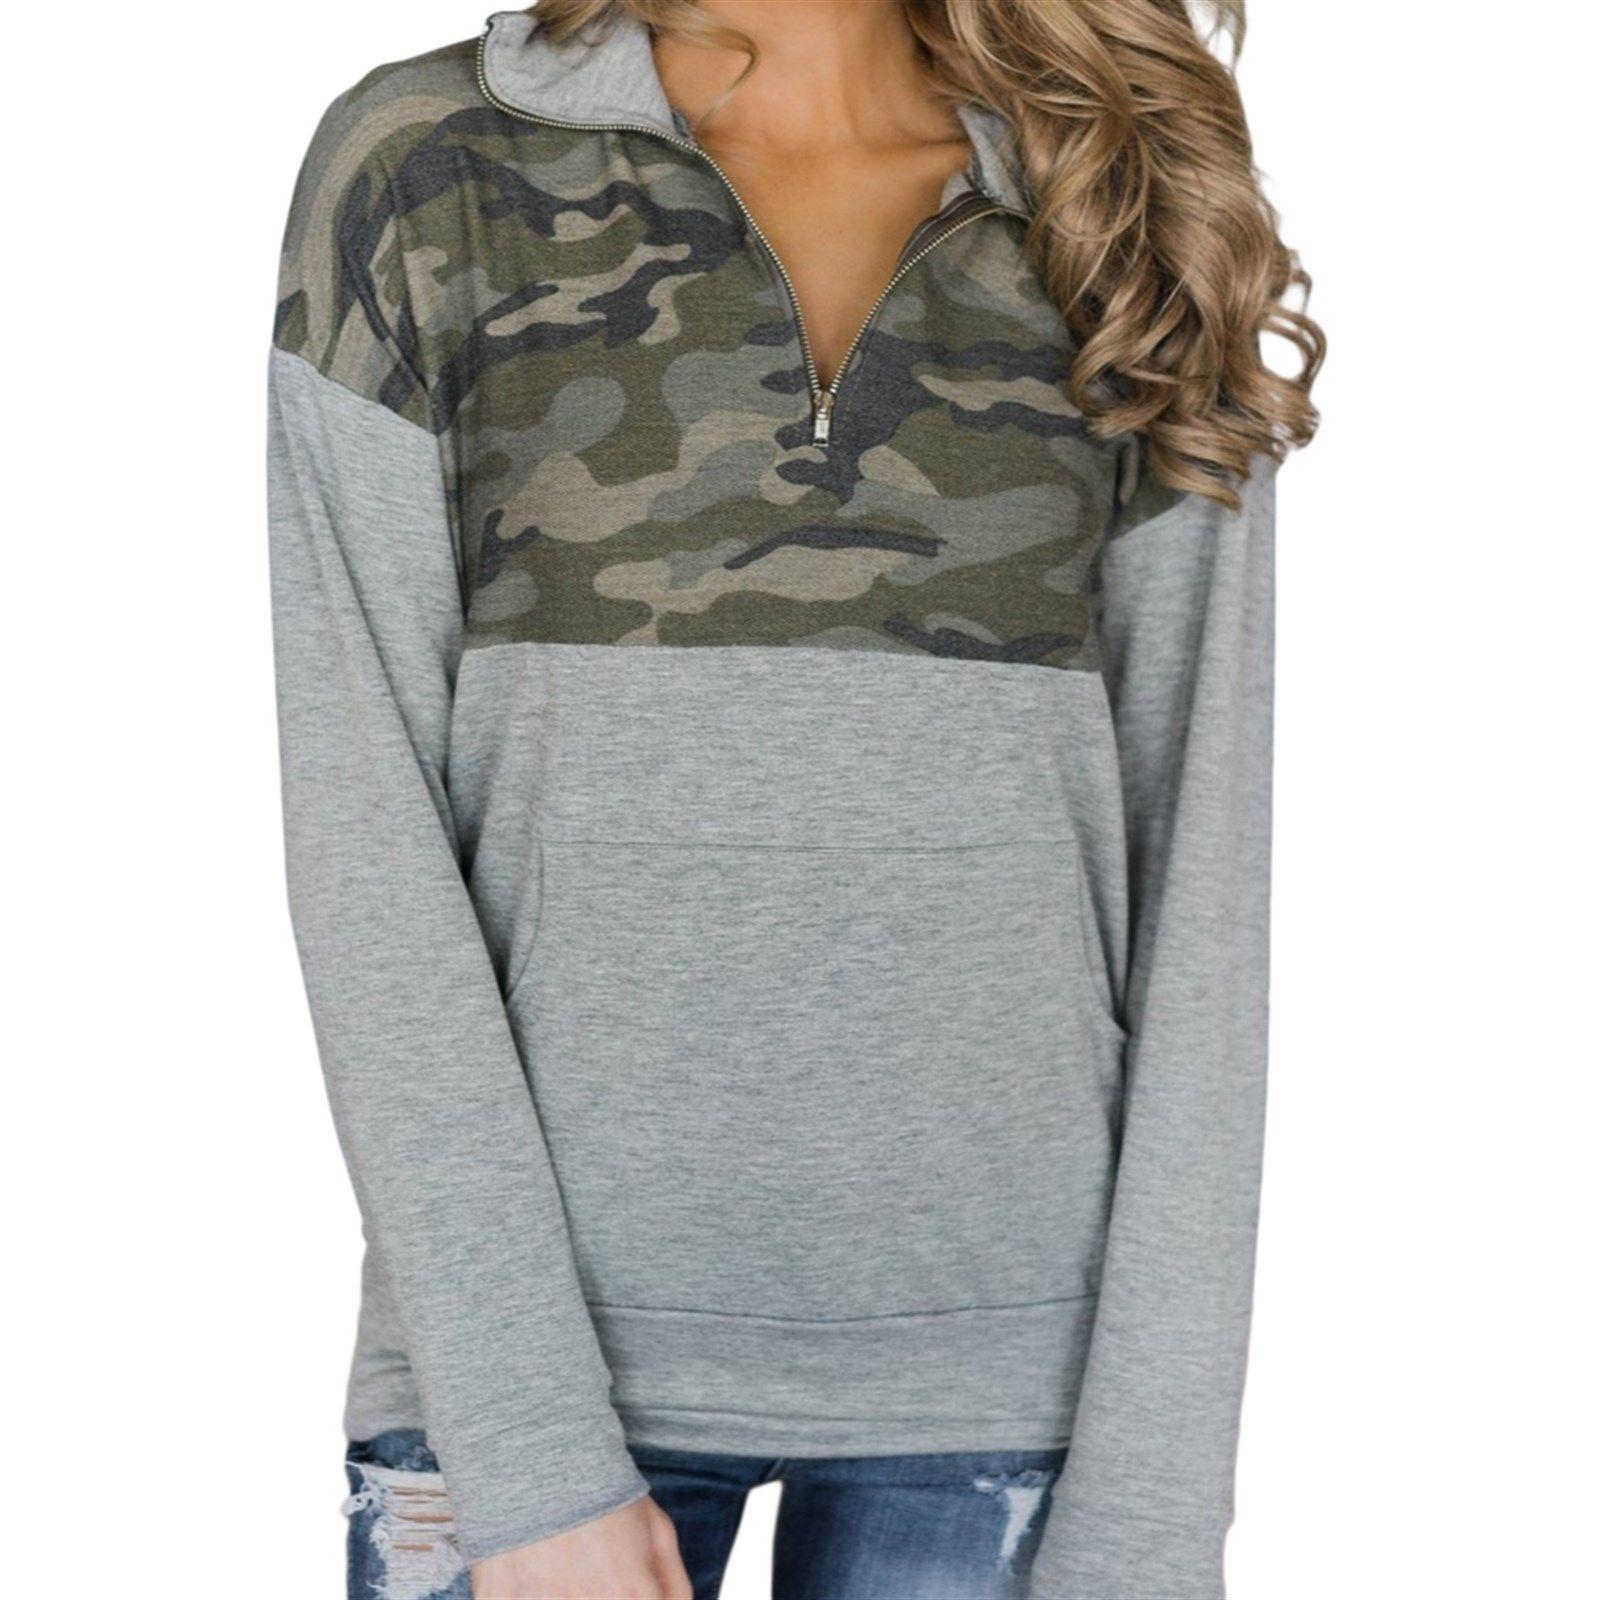 Kangaroo Pocket Zip Collar Sweatshirt in Christmas ideas